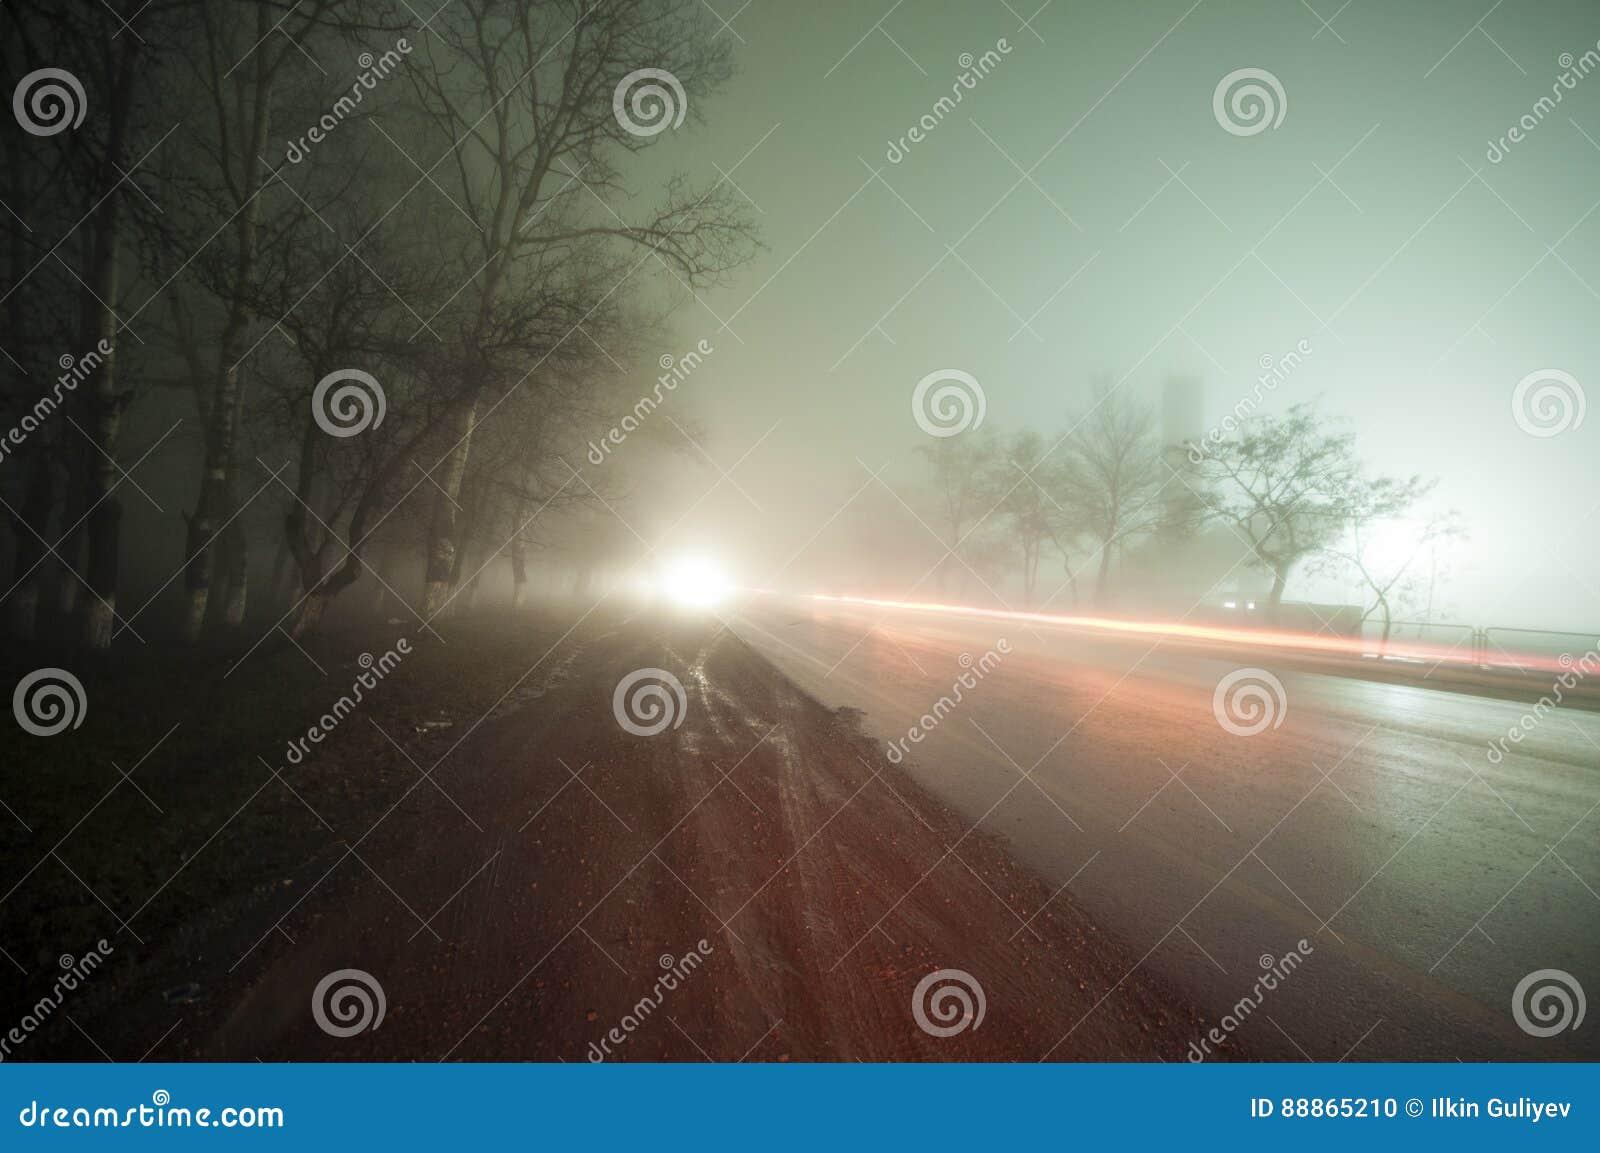 Beautiful night landscape of foggy road in a dark forest after rain. Azerbaijan